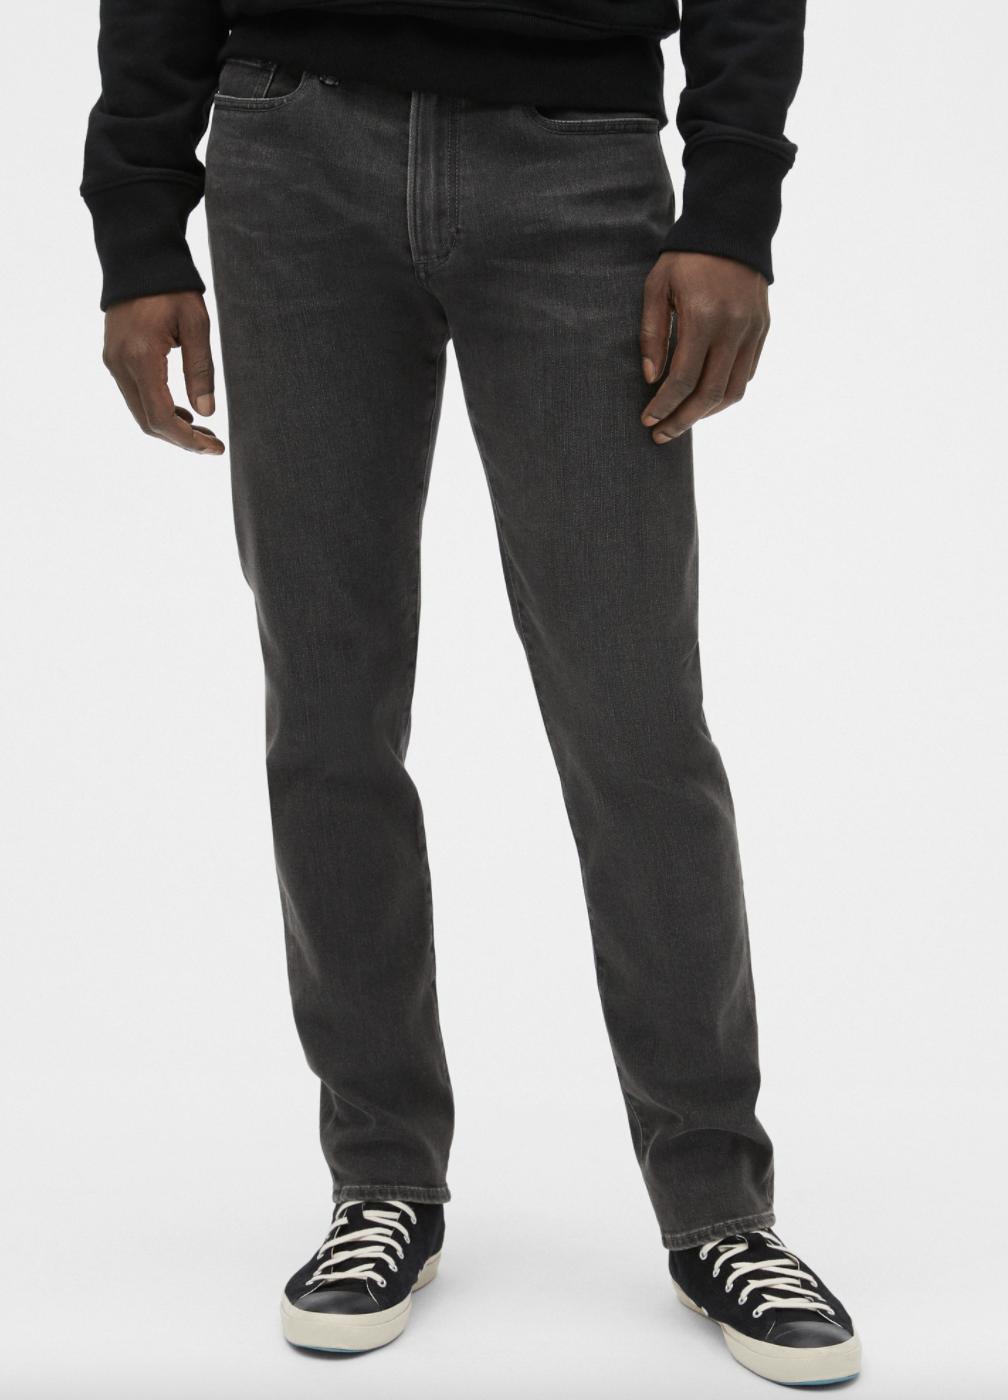 best men's jeans gap